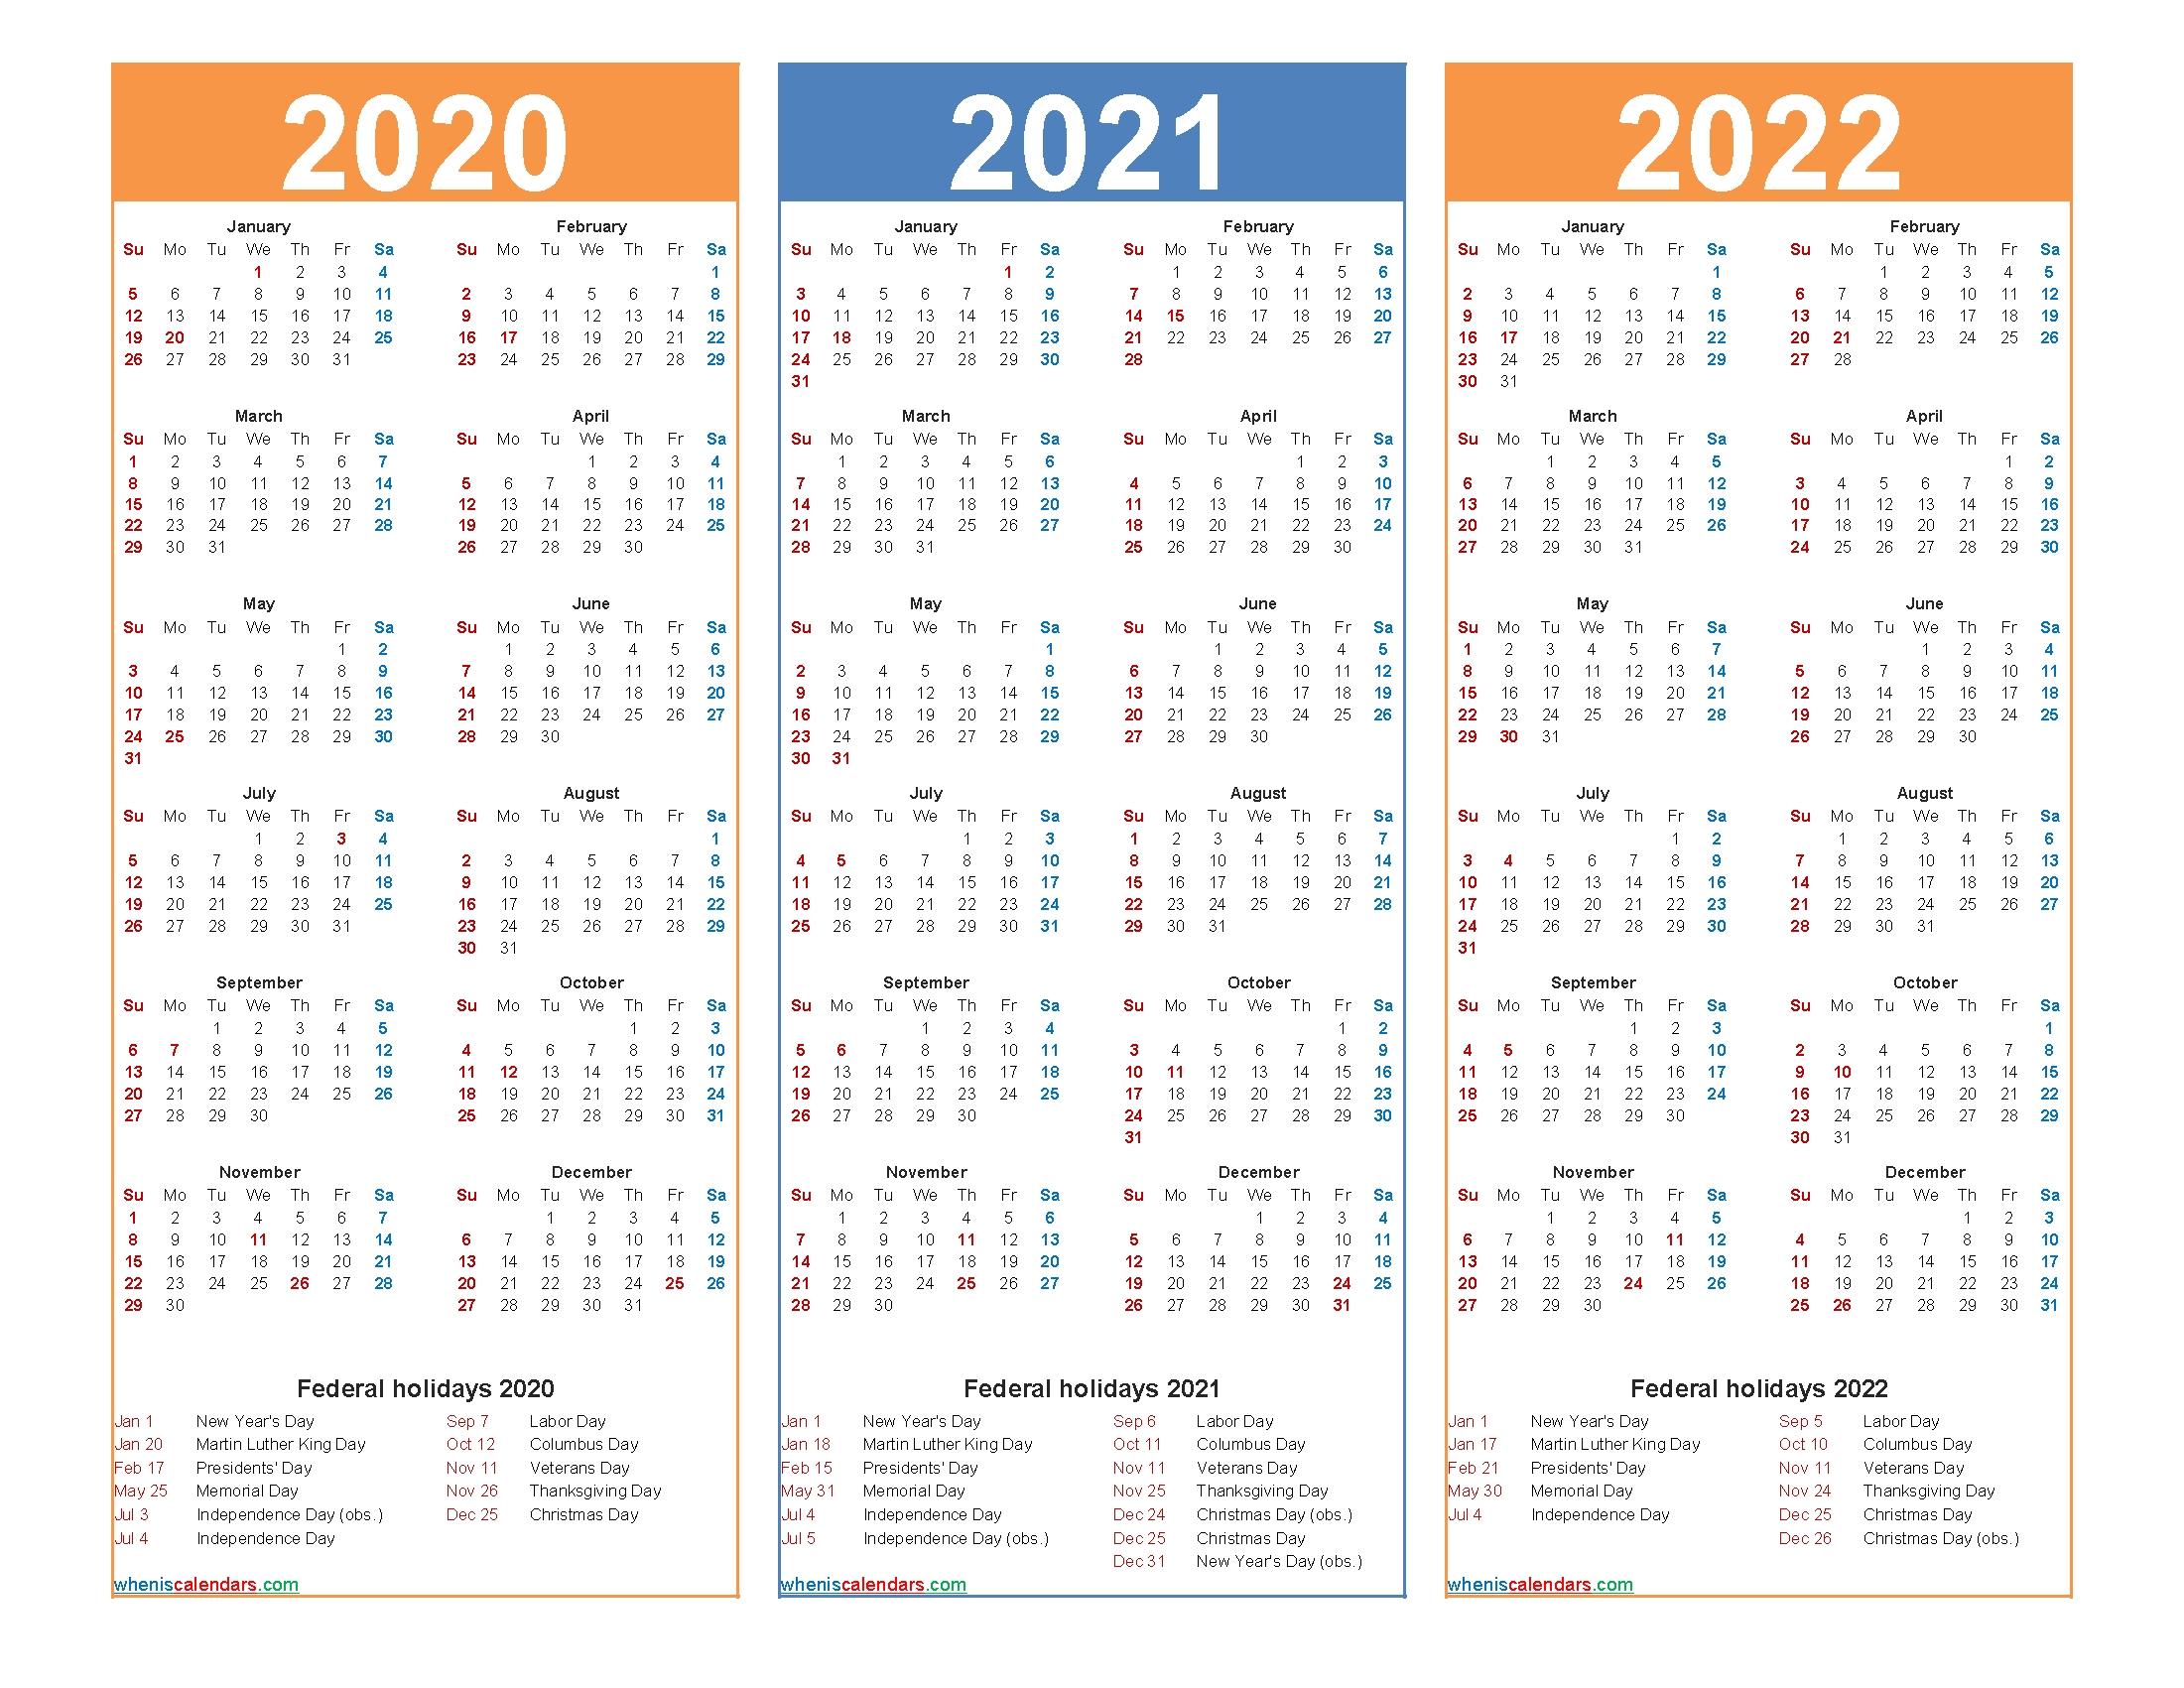 Printable Calendar 2020 2021 2022 With Holidays